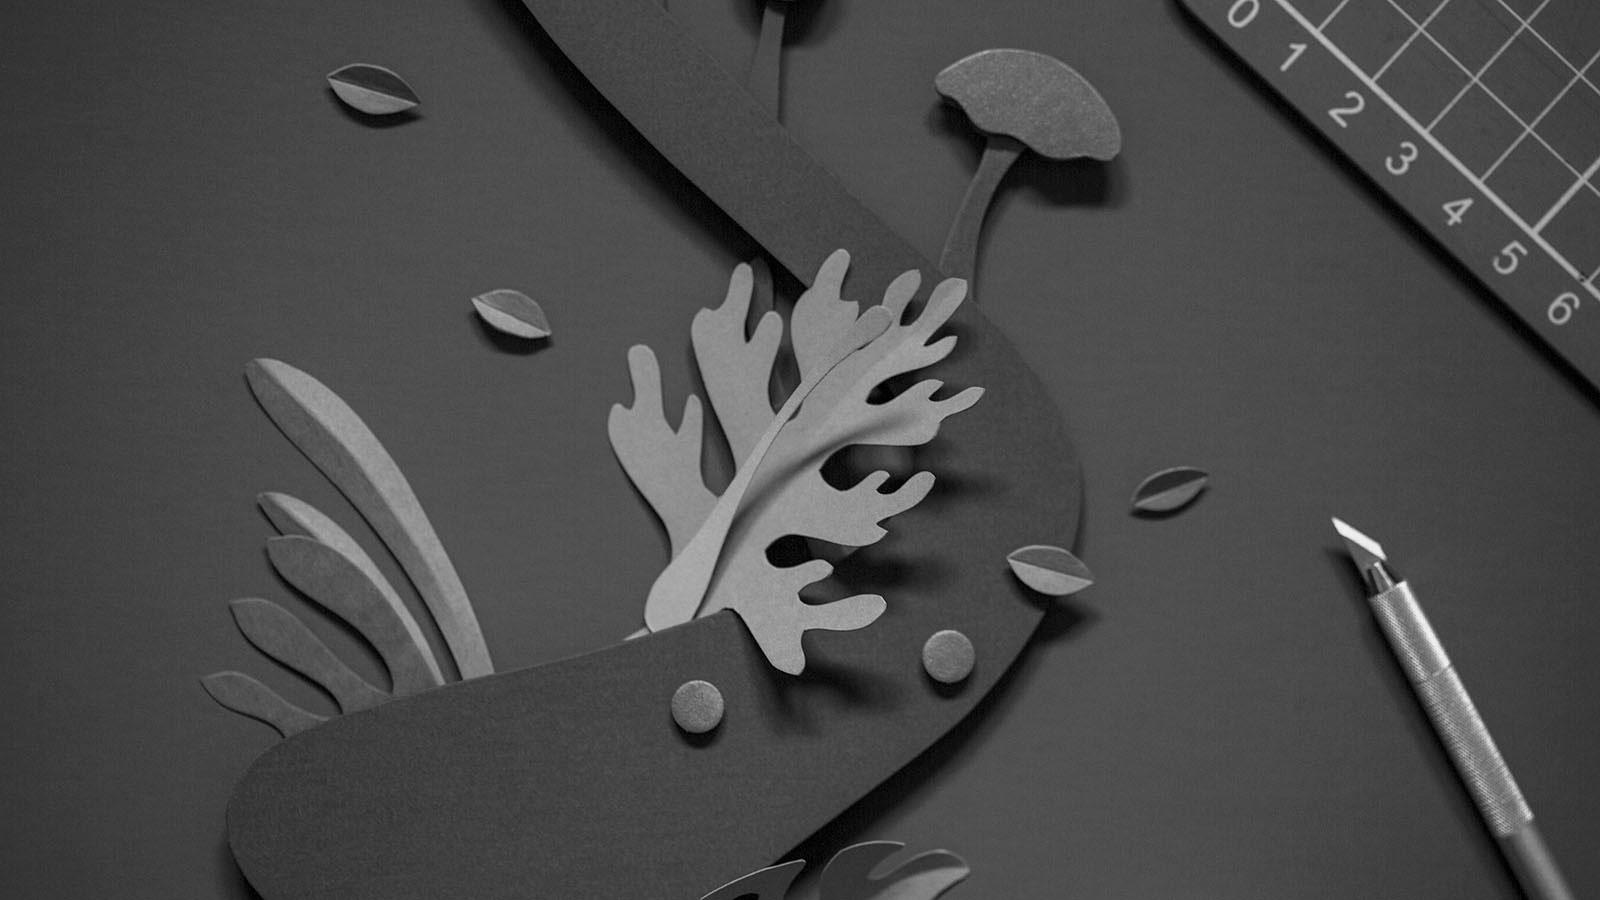 Cut Paper Illustrations Create Shadow and Depth in Imaginative Environments by John Ed De Vera